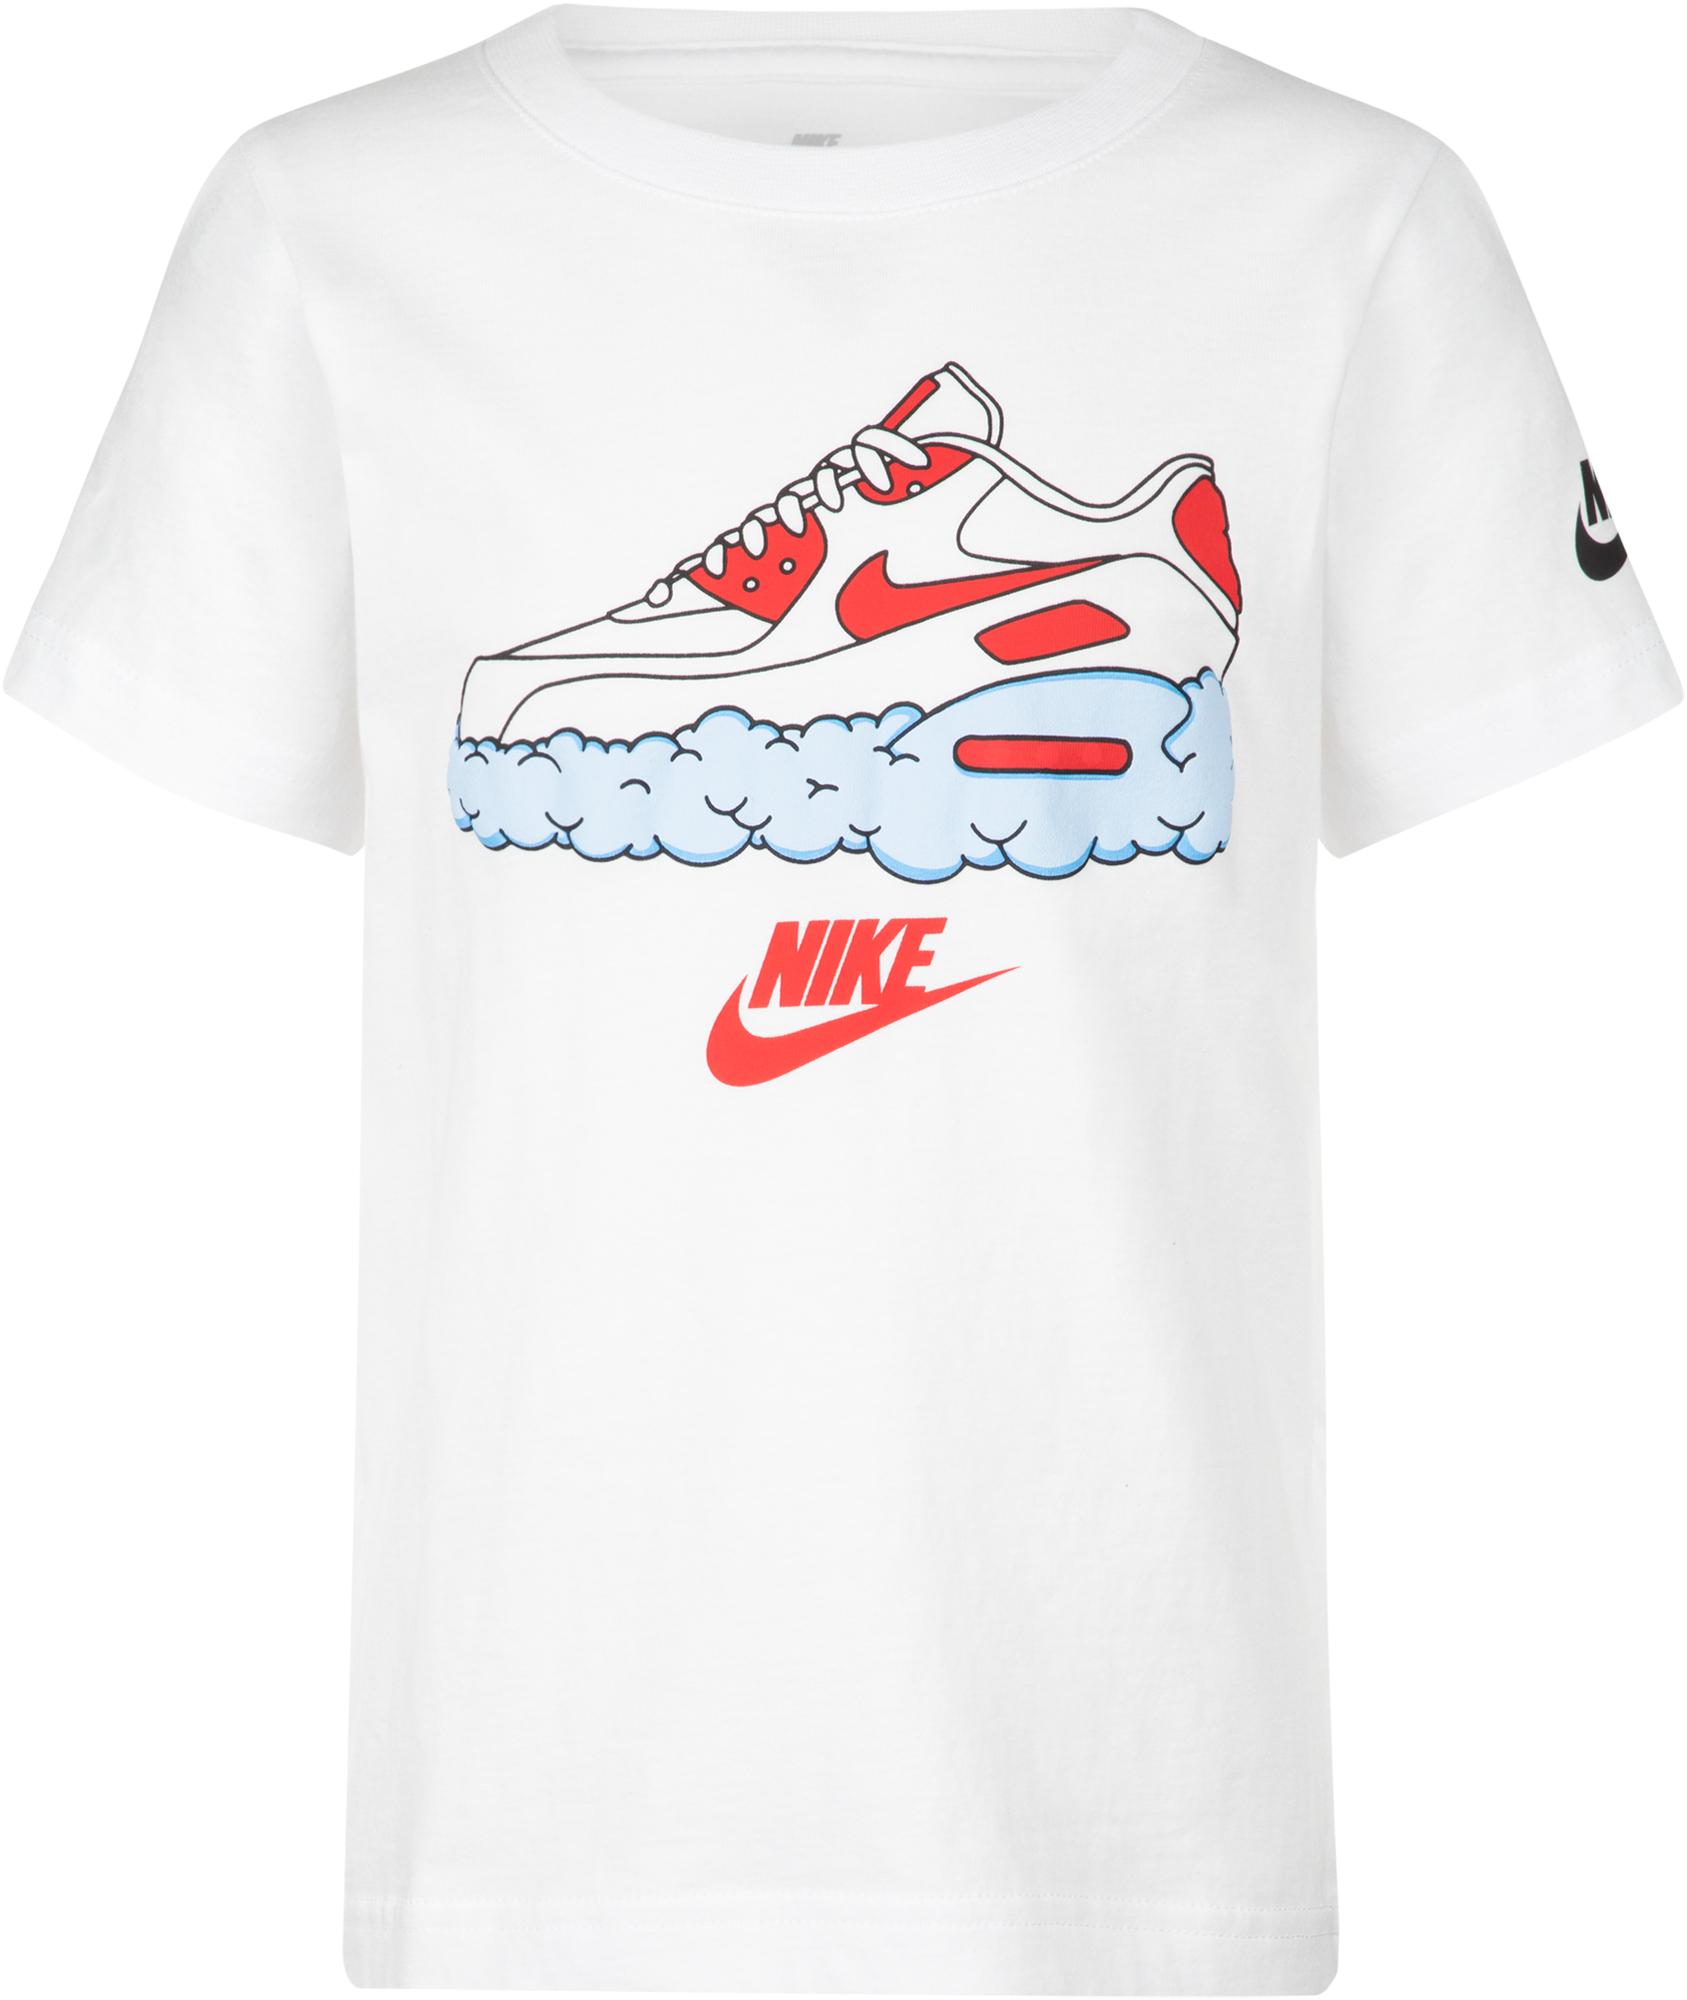 Nike Футболка для мальчиков Nike Airmax Clouds, размер 122 nike футболка для мальчиков nike geo basketball